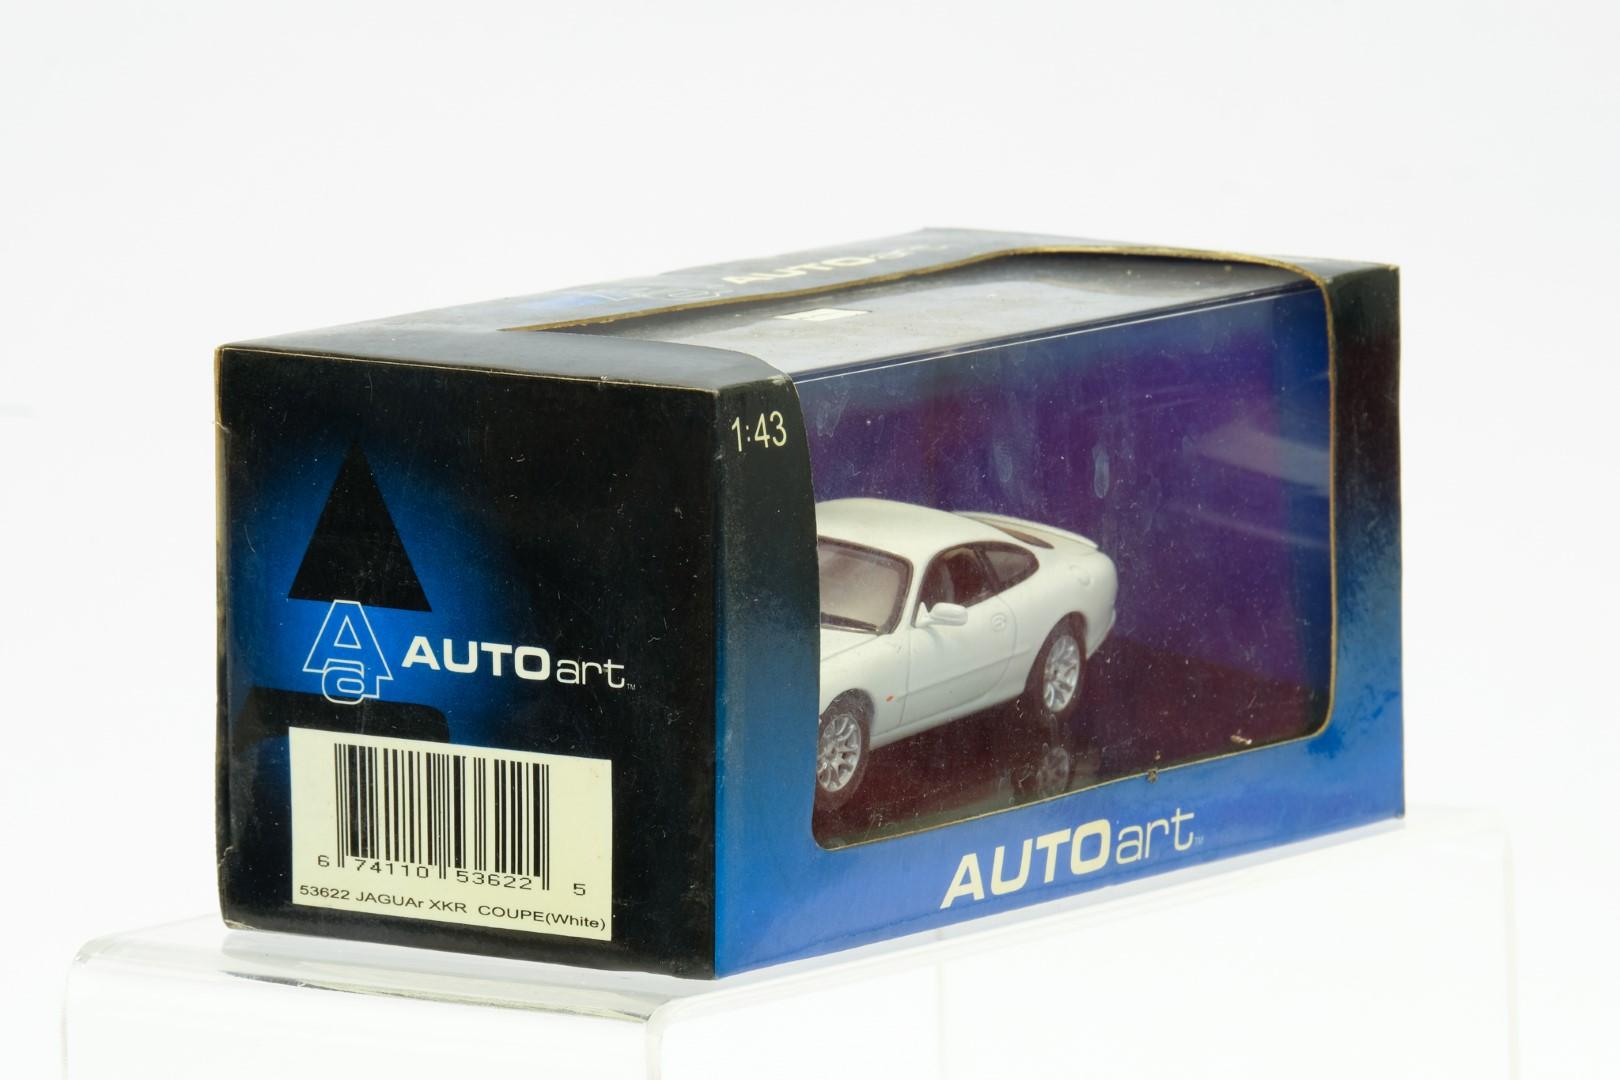 Autoart Jaguar XKR Coupe White - Image 2 of 3